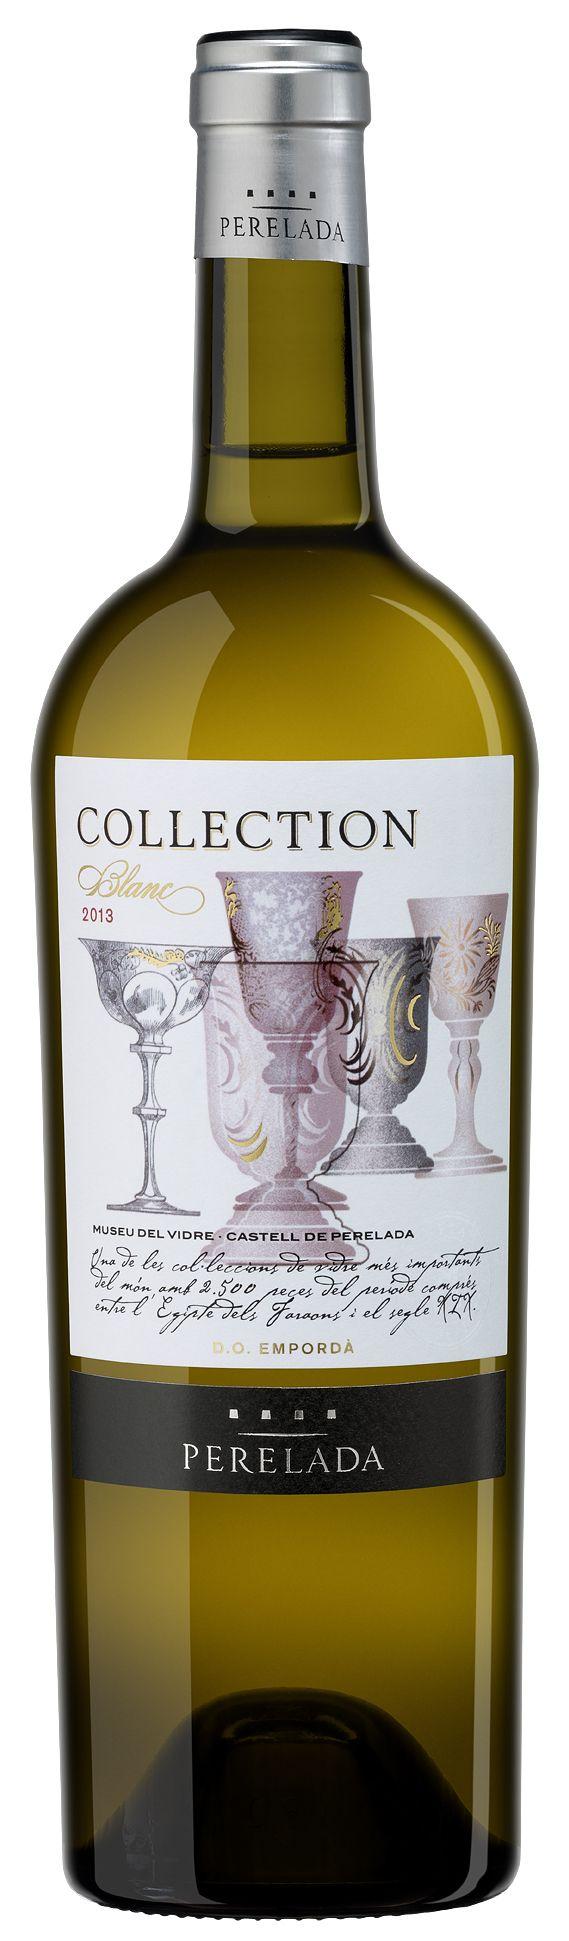 Nuevo Perelada Collection: Chardonnay +  Sauvignon Blanc, parcialmente envejecido en barricas de acacia.  Nou Perelada Collection: Chardonnay +  Sauvignon Blanc, parcialment envellit dins bótes d'acàcia.  New Perelada Collection: Chardonnay +  Sauvignon Blanc, partially aged in acacia barrels.